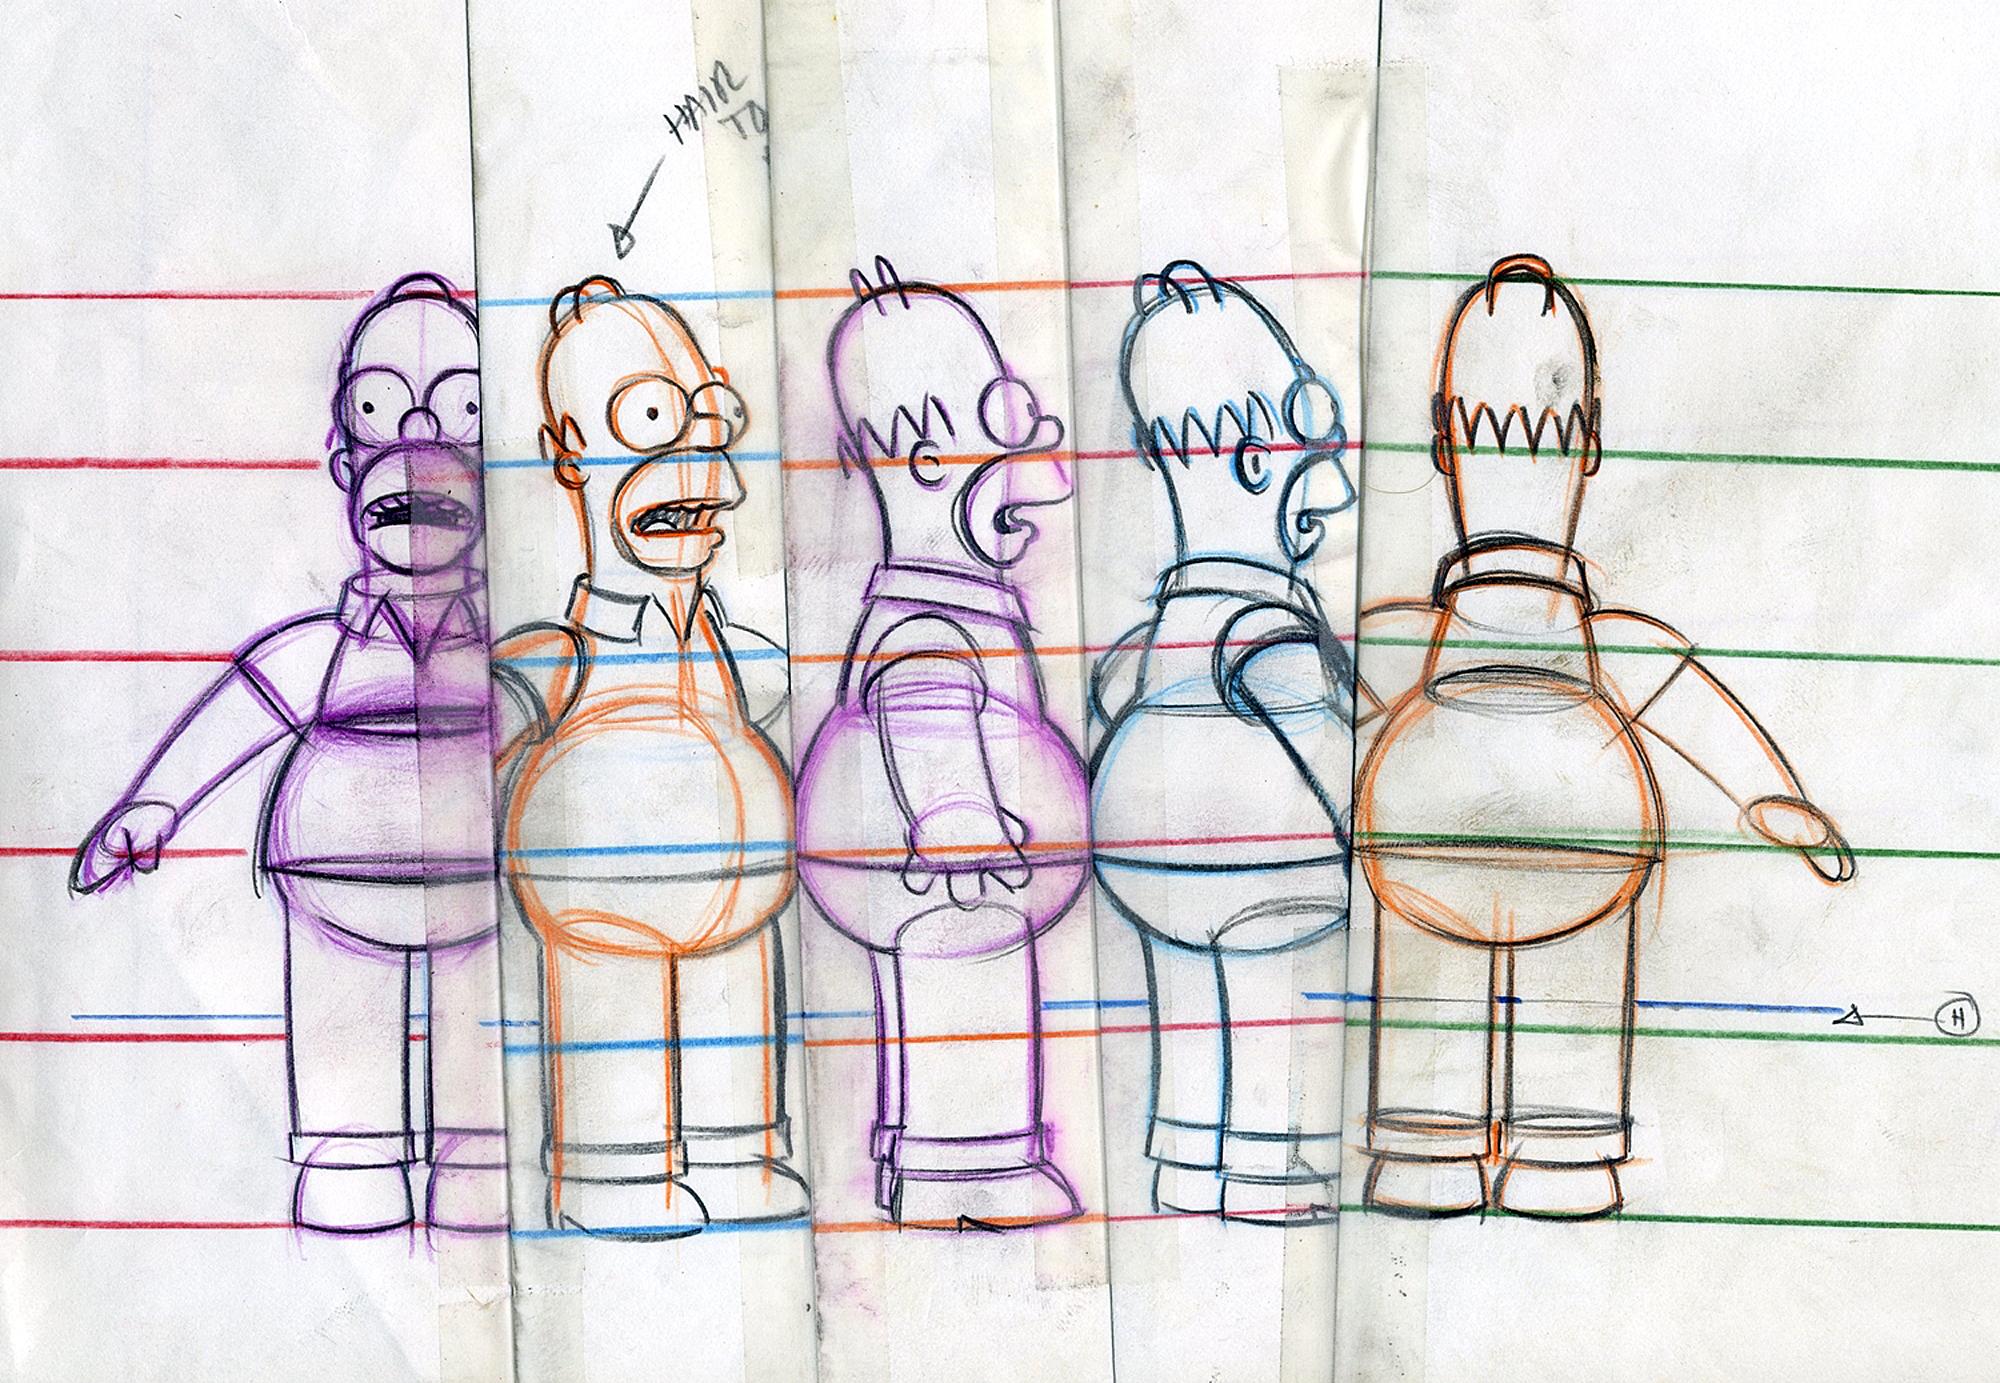 The SimpsonsCredit: Bob Anderson